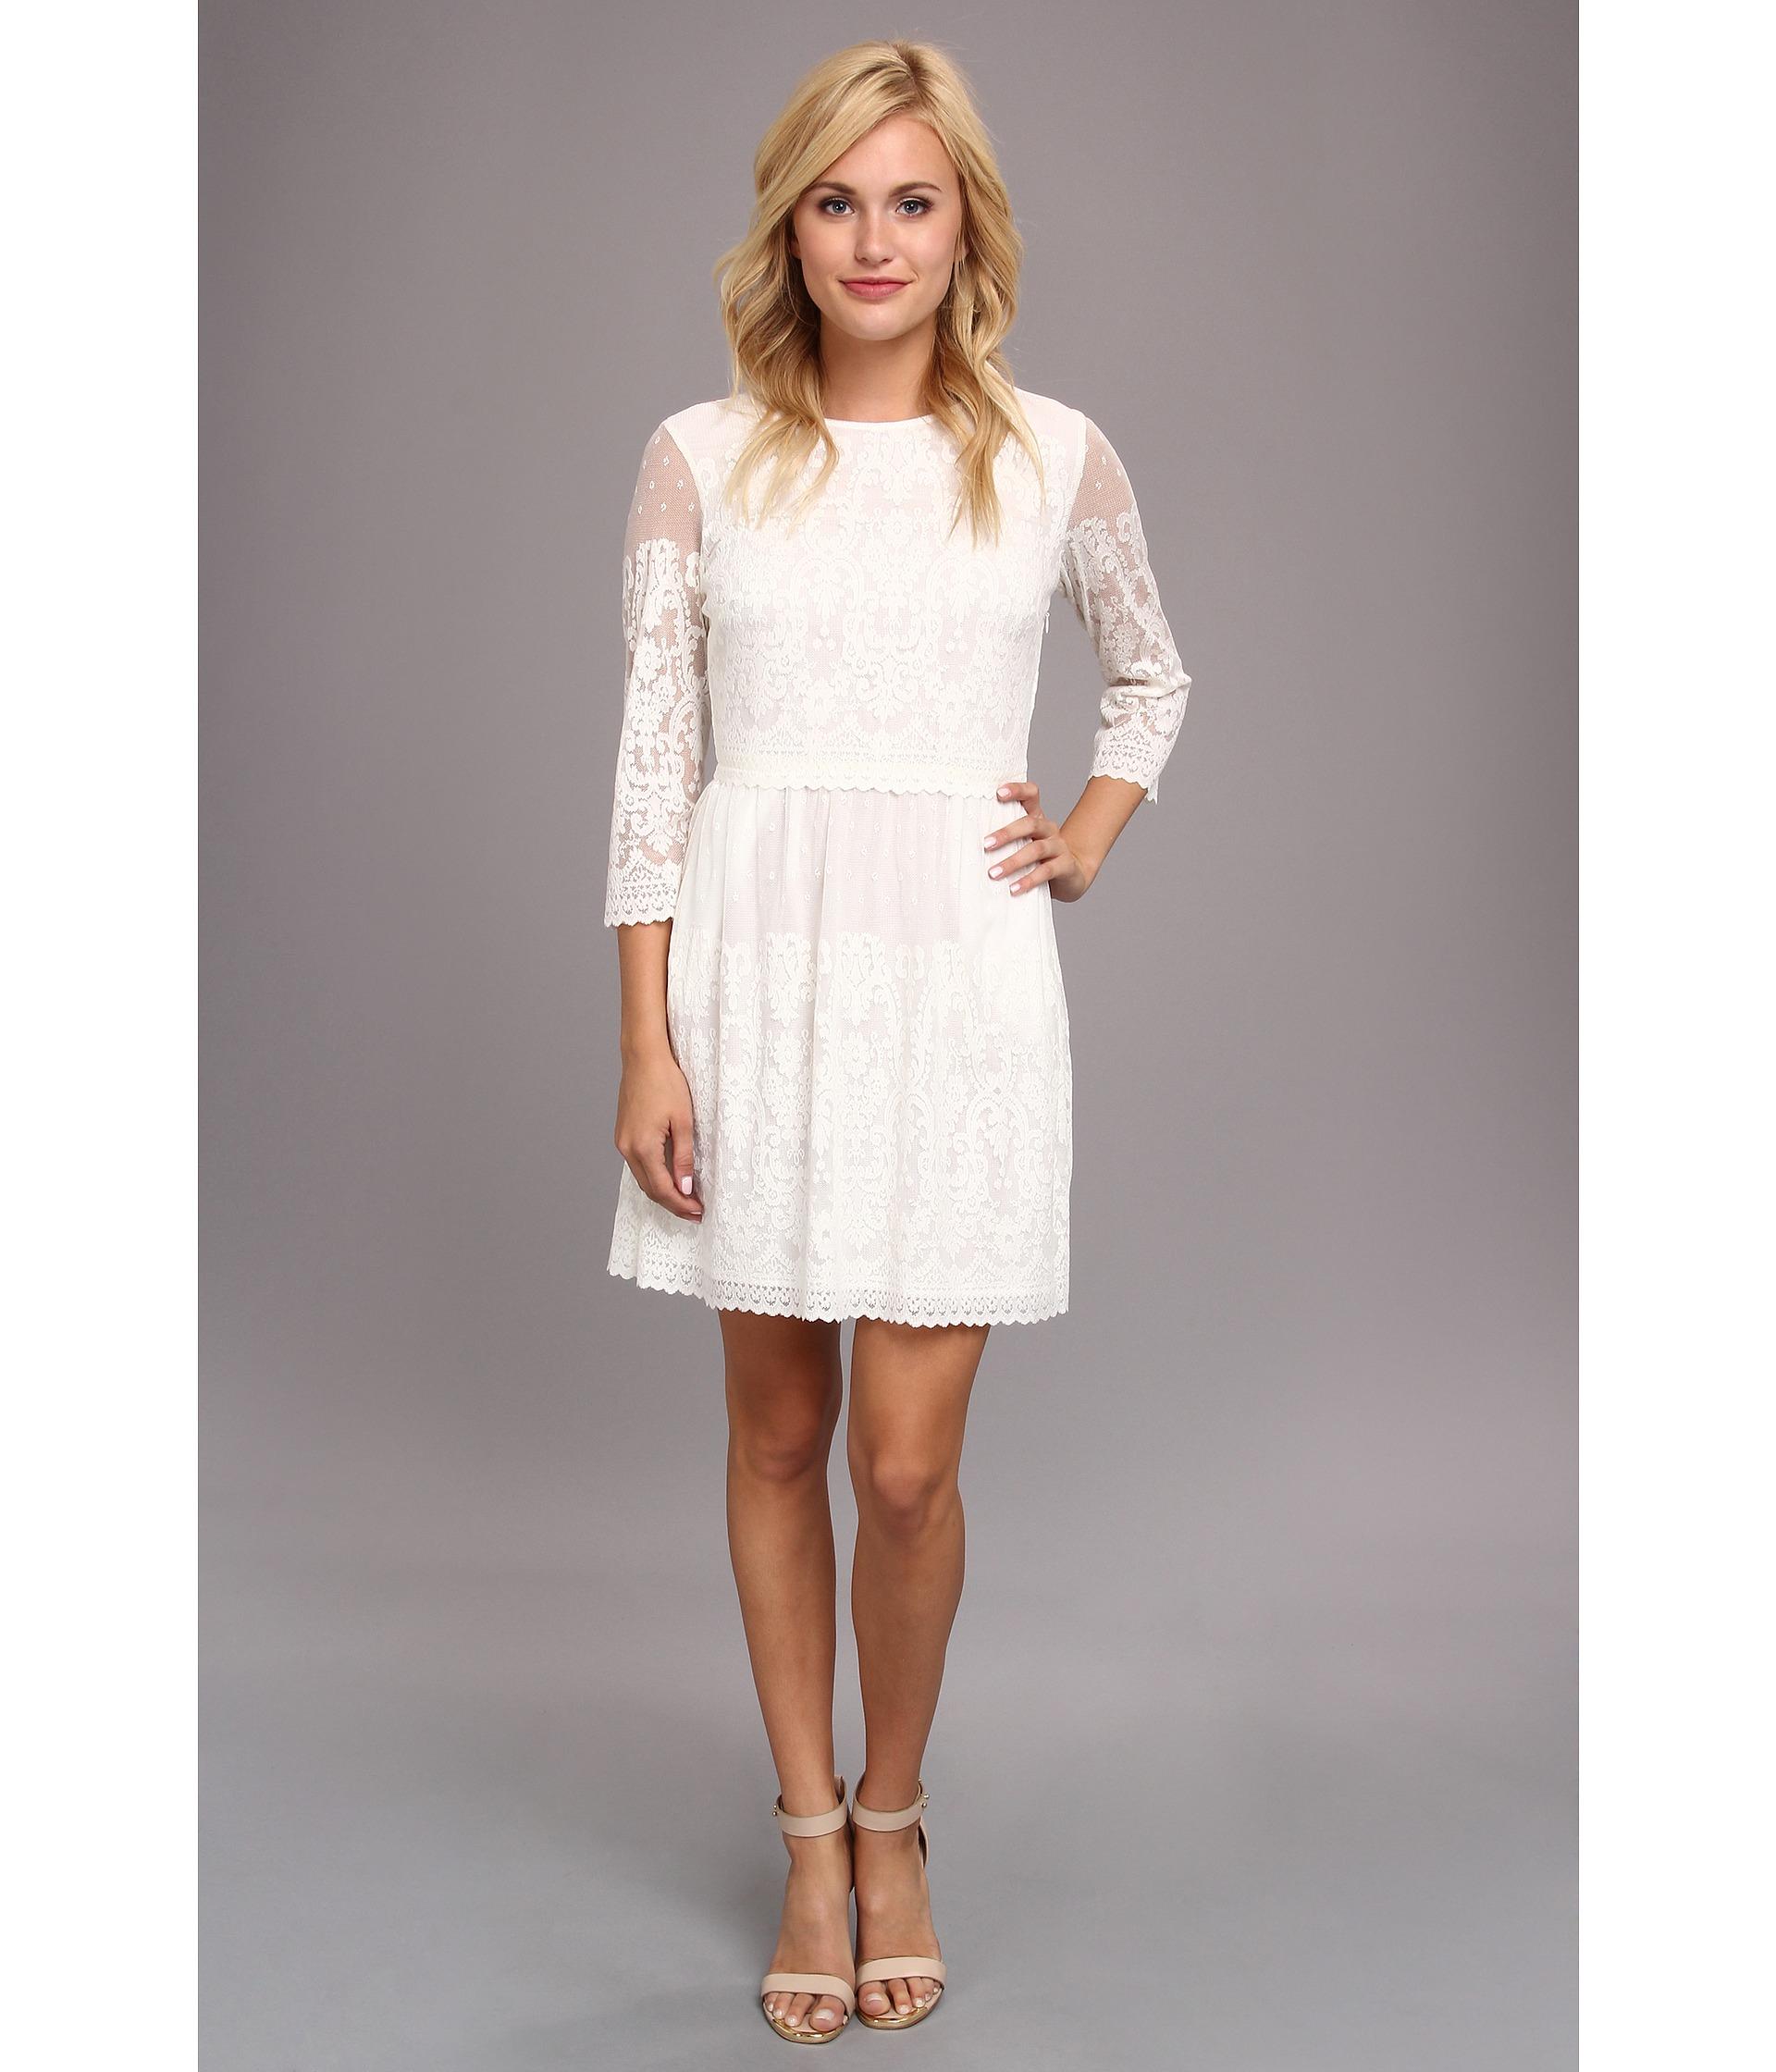 3/4 Sleeve White Lace Dress